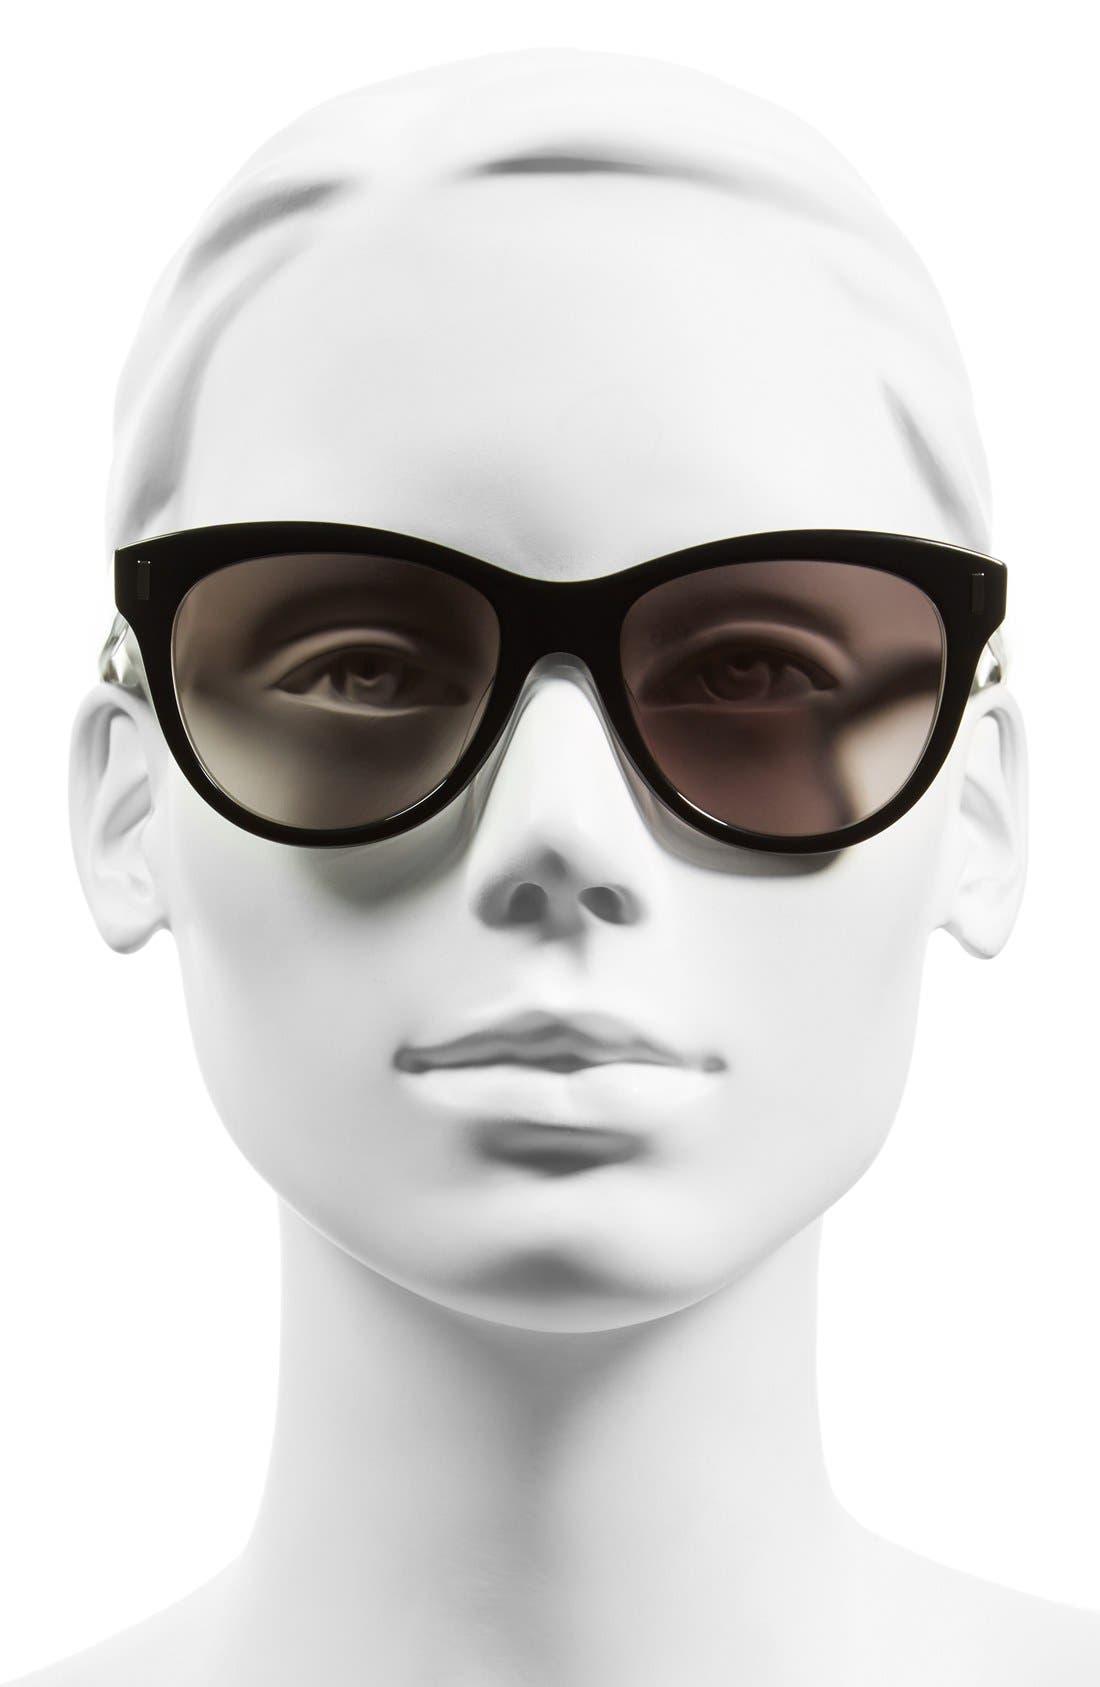 53mm Retro Sunglasses,                             Alternate thumbnail 2, color,                             001